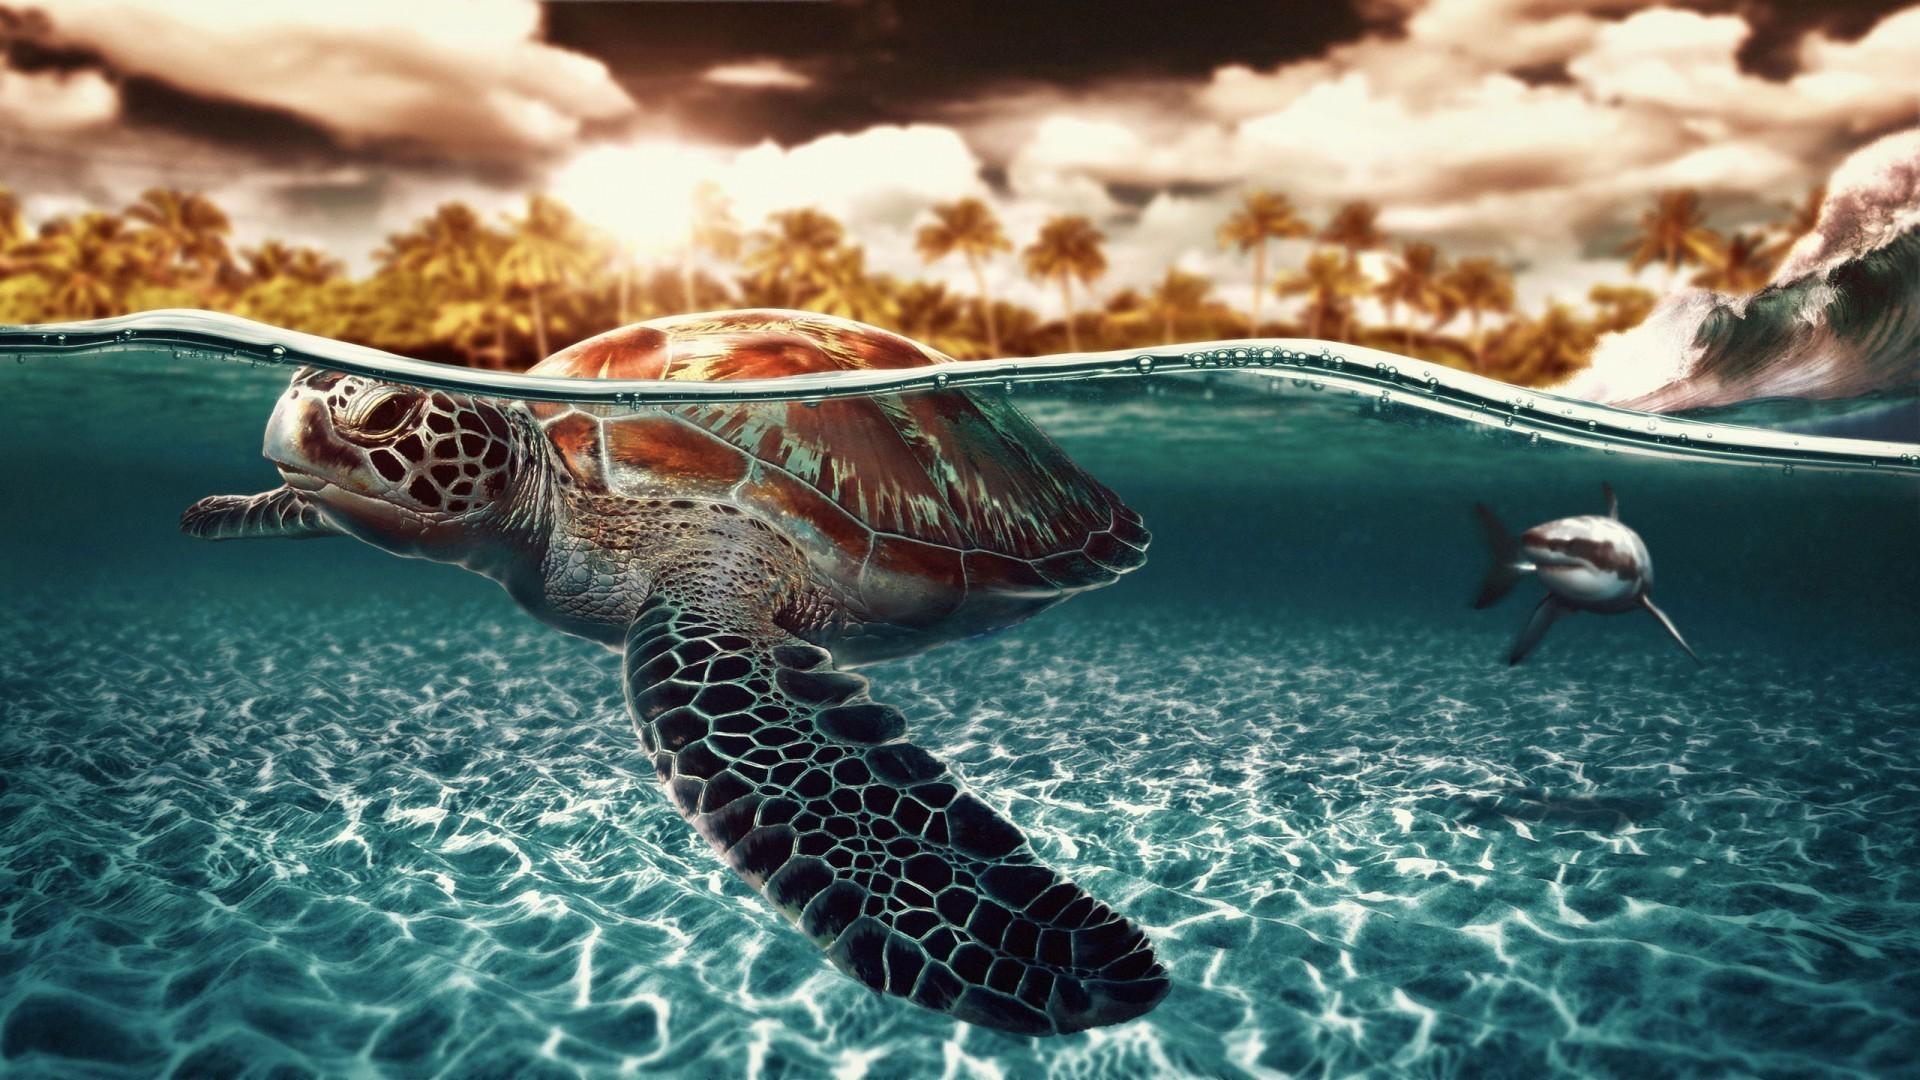 черепаха планета картинка на рабочий стол